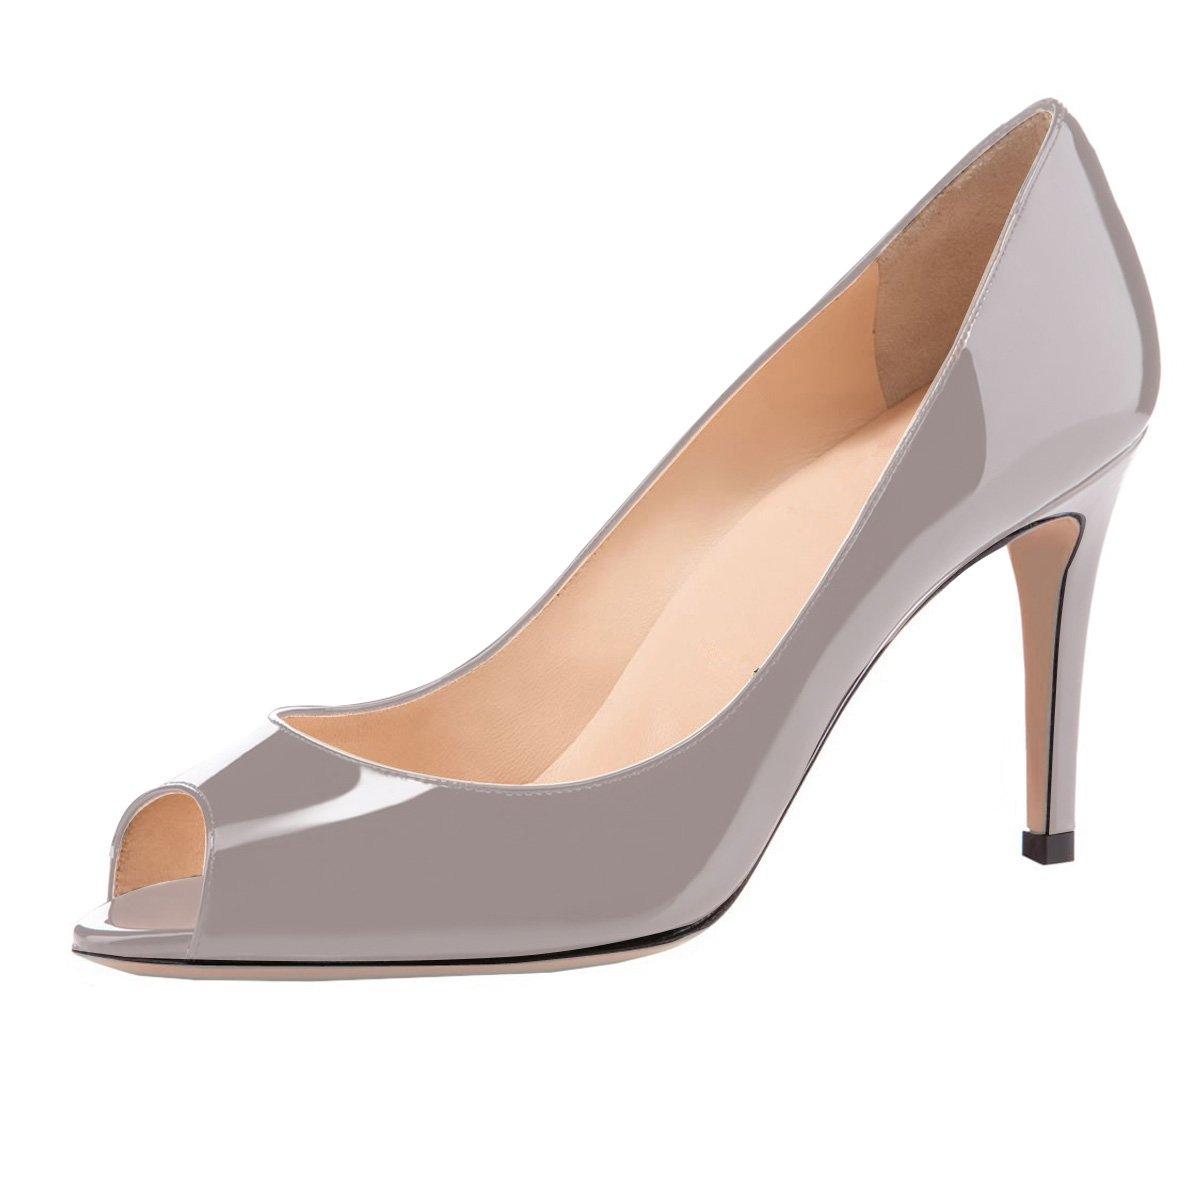 Eldof Women Peep Toe Pumps Mid-Heel Pumps Formal Wedding Bridal Classic Heel Open Toe Stiletto B07F1RZX5J 6.5 B(M) US|Gray